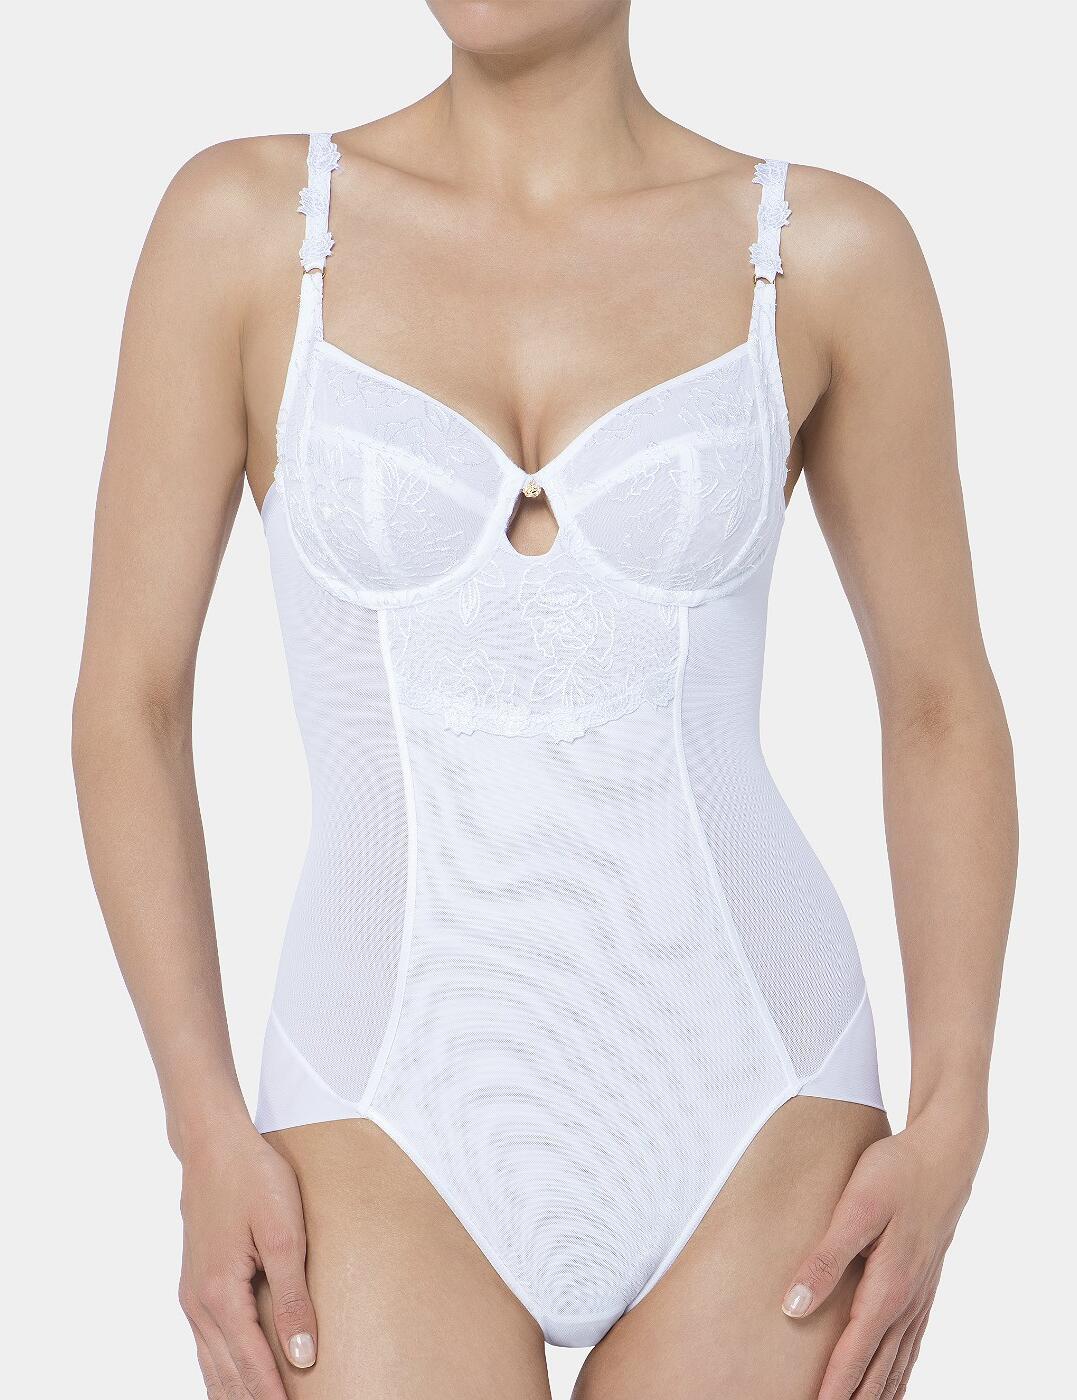 10181818 Triumph Wild Rose Florale Bodysuit - 10181818 White